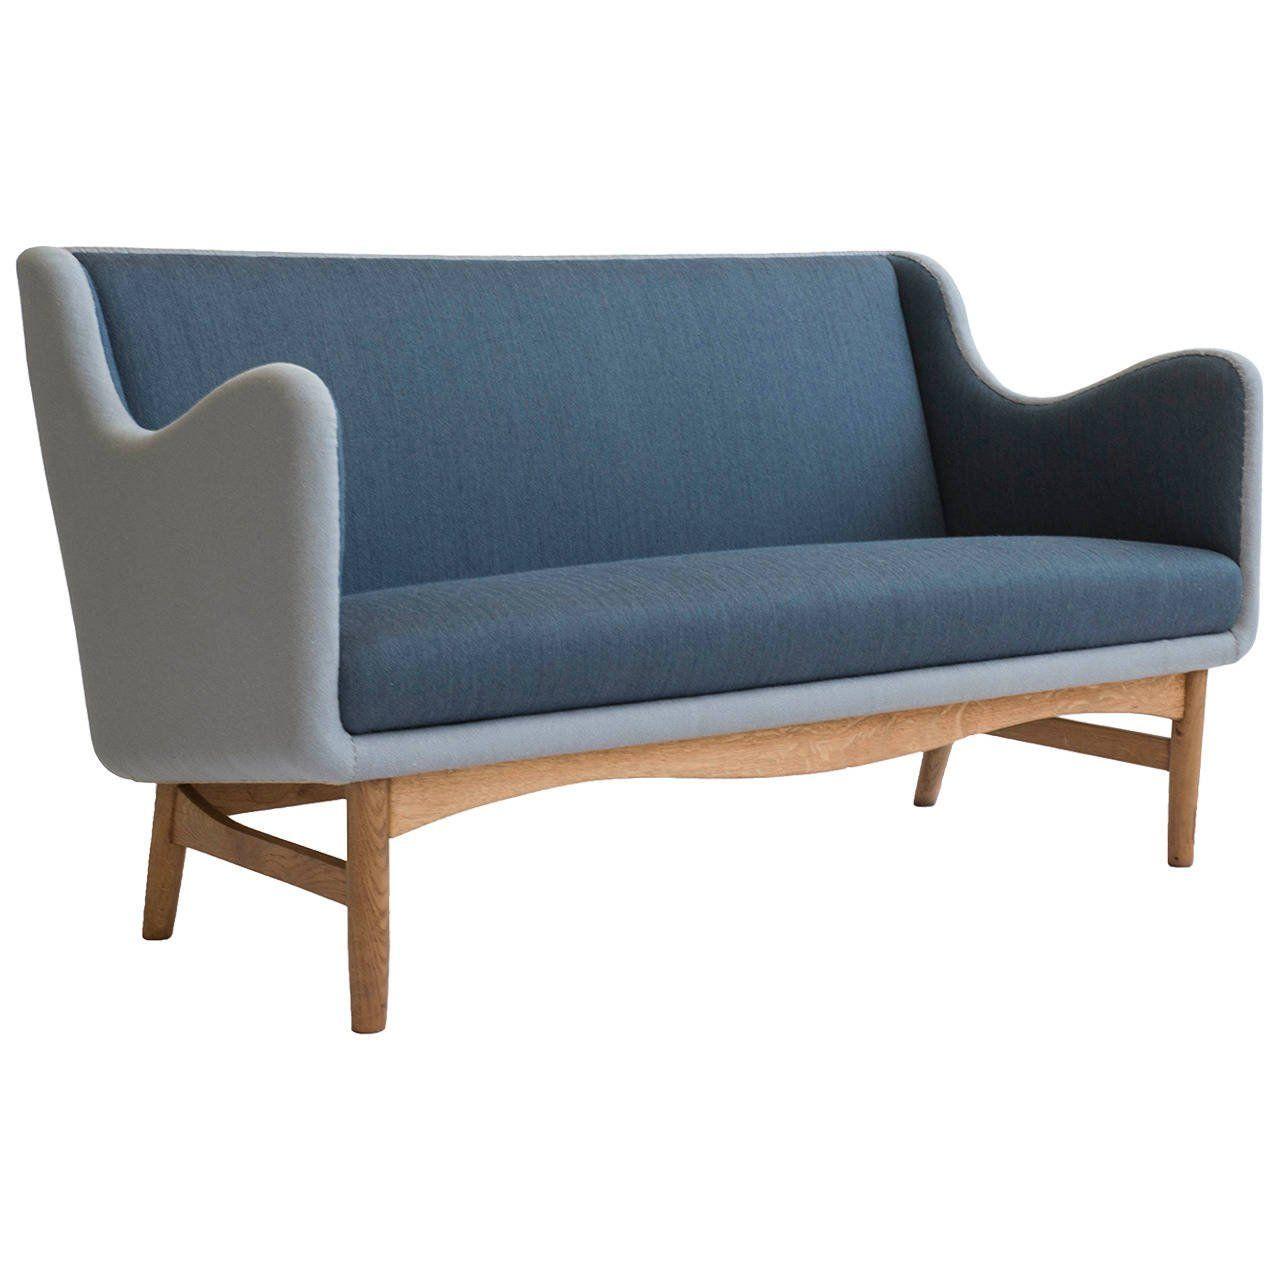 Finn Juhl U0027Poetu0027 Sofa For Niels Vodder | Modern, Mid Century And  Mid Century Modern.